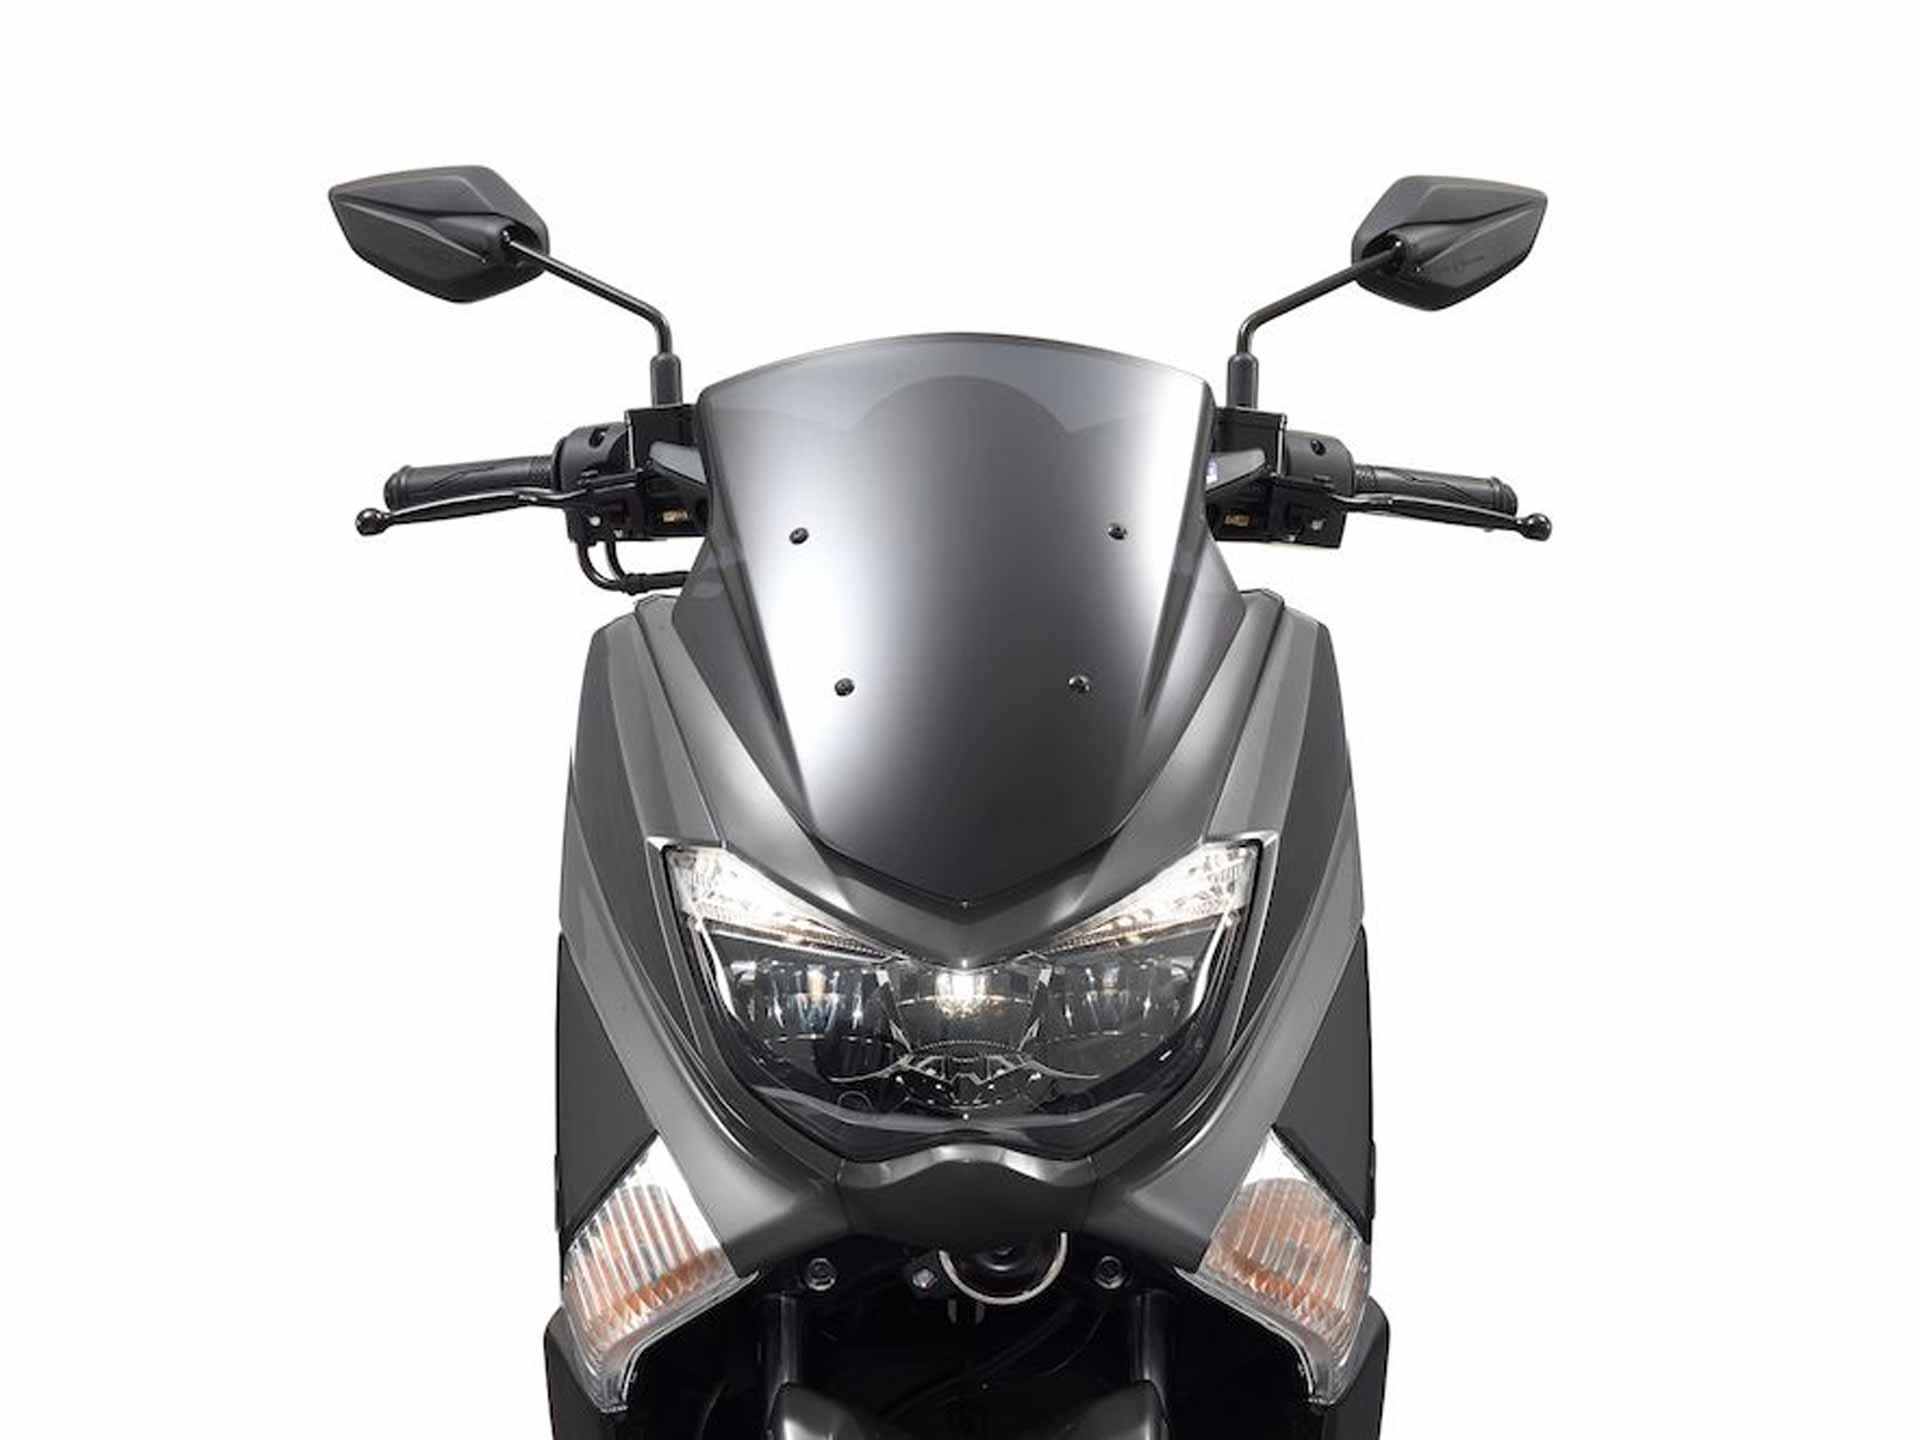 Yamaha NMax 125 | Streetbike